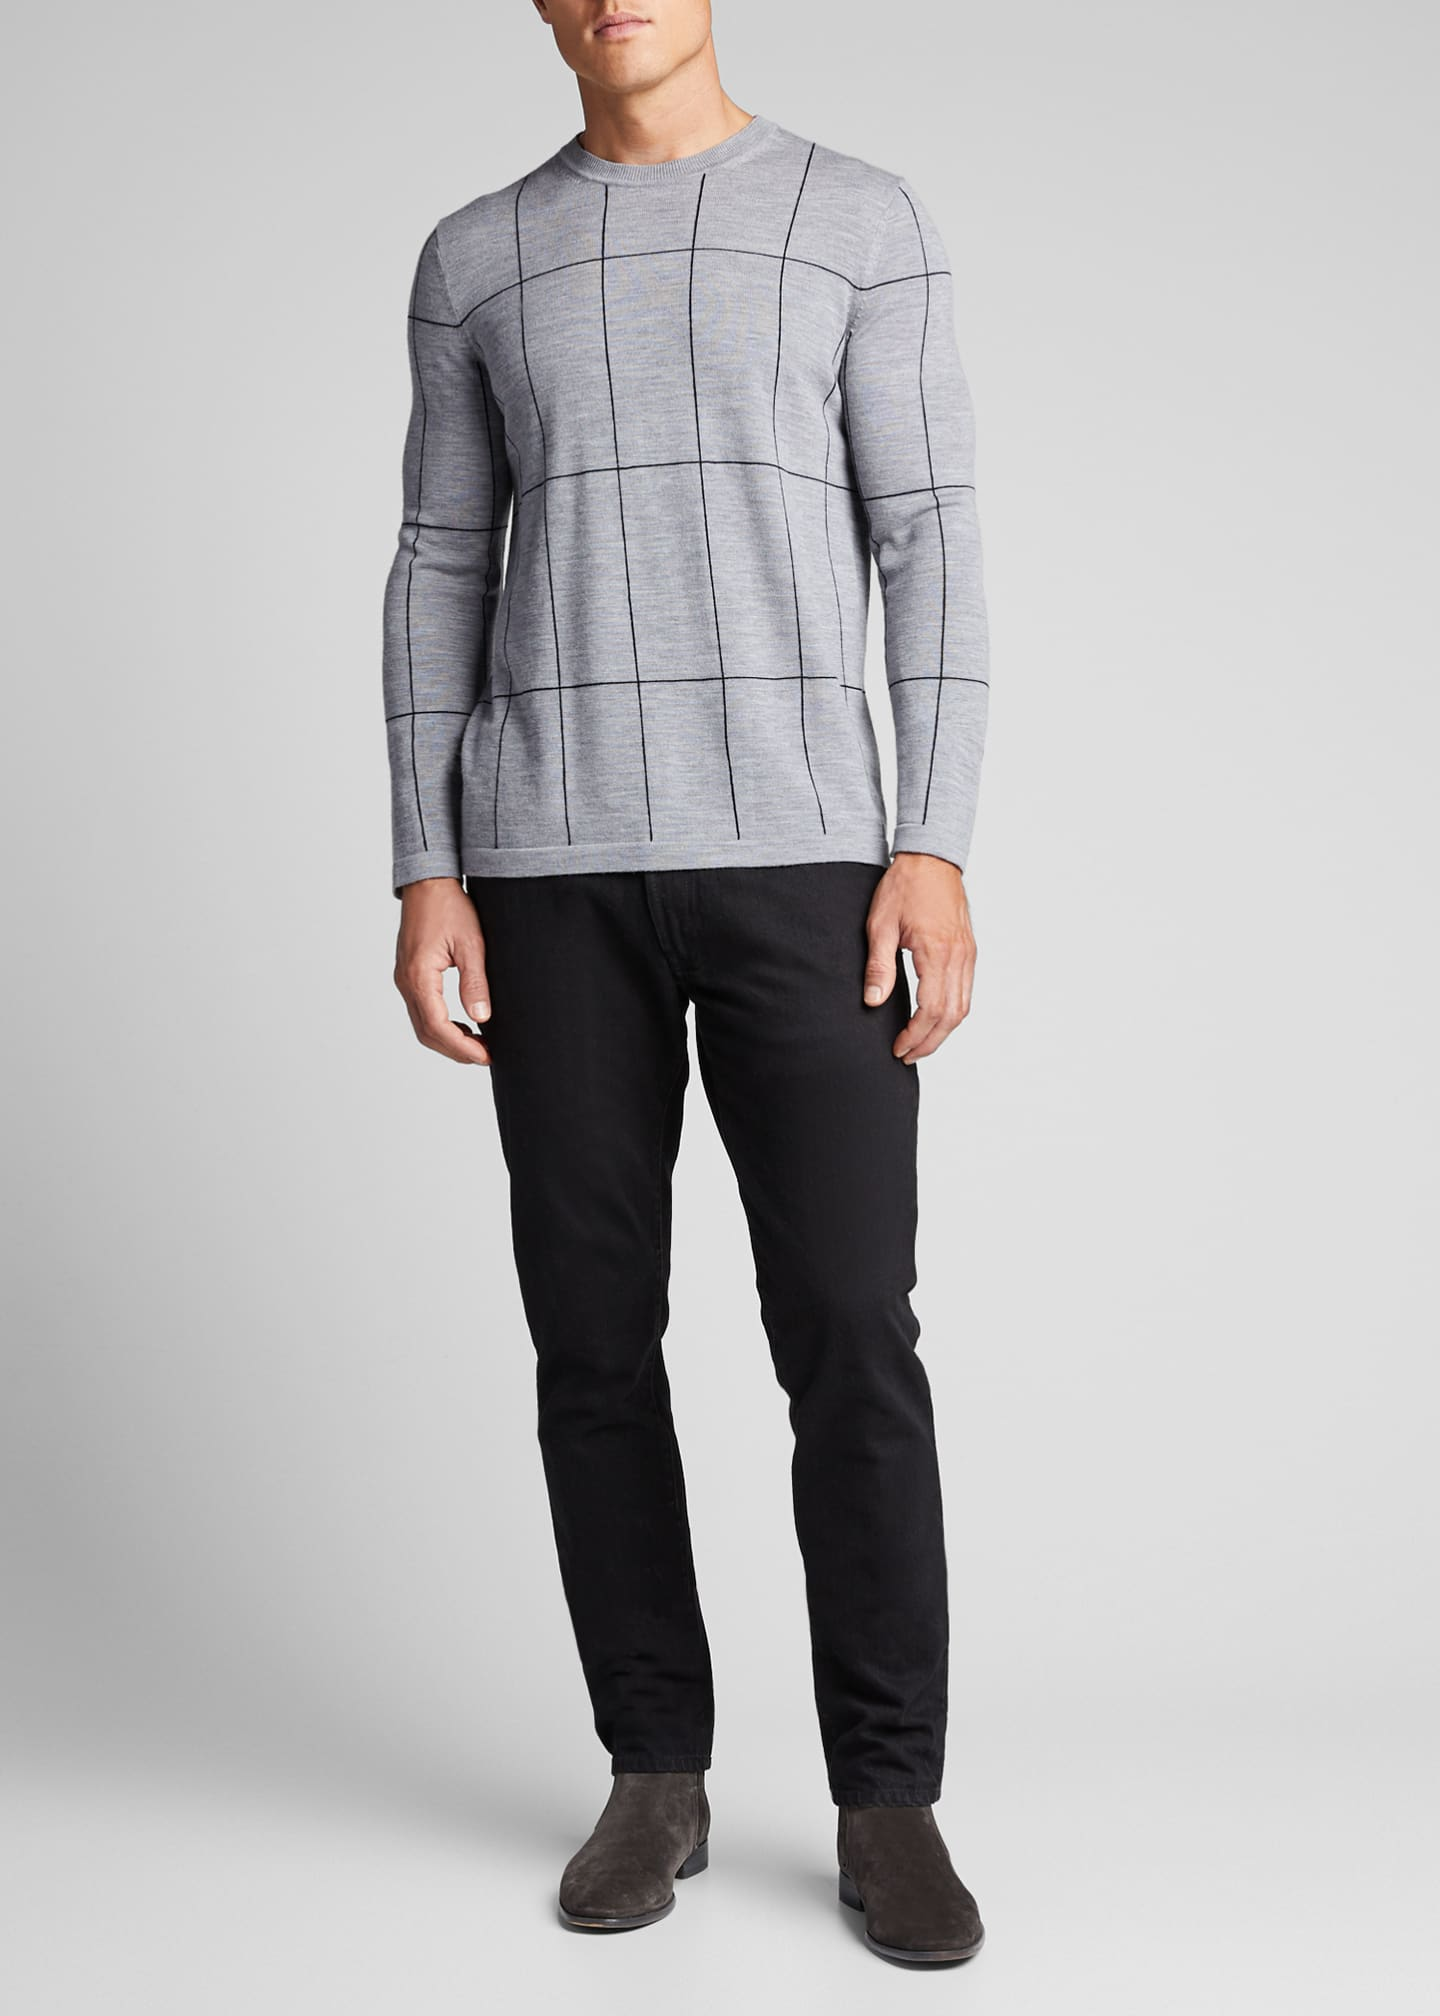 Theory Men's Malio Milos Grid Check Wool Sweater